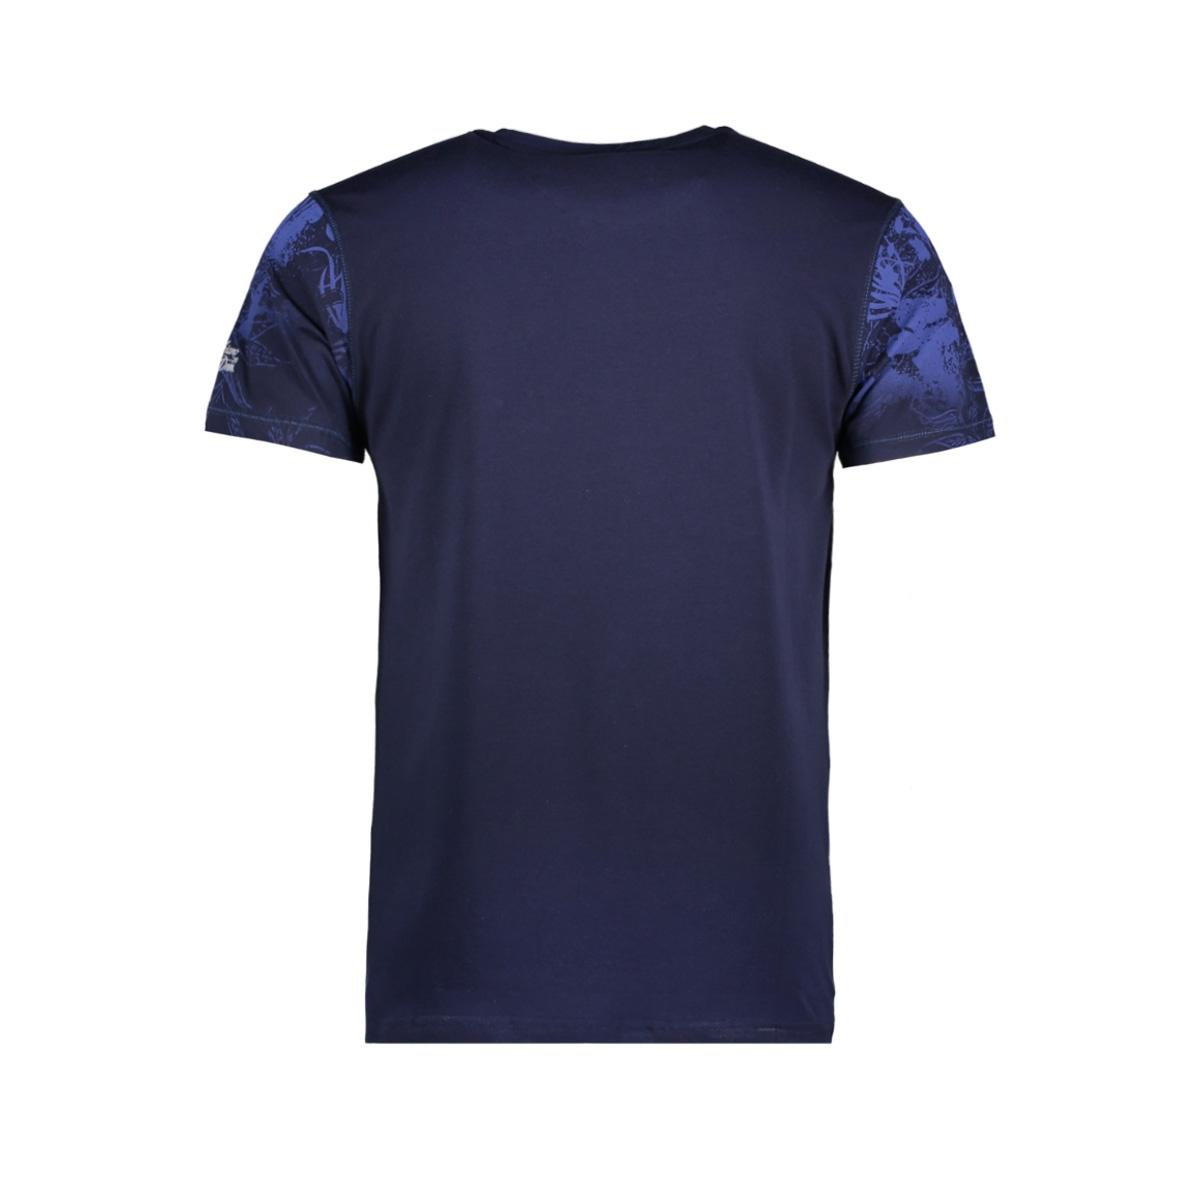 13895 gabbiano t-shirt navy